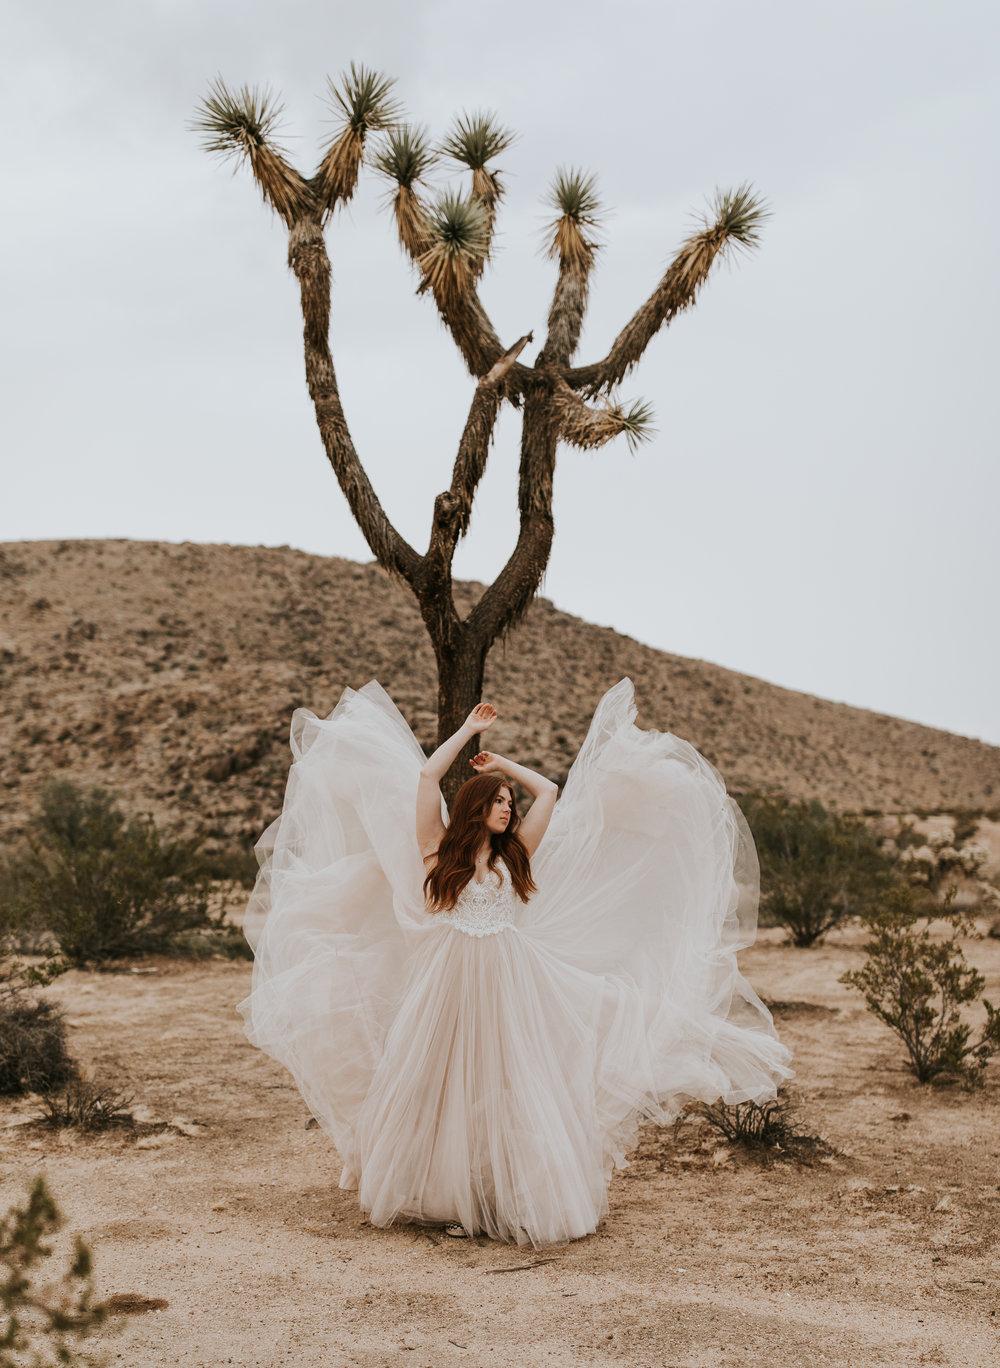 Emilie- Photo by Wild Heart Visuals (Nicole Little)